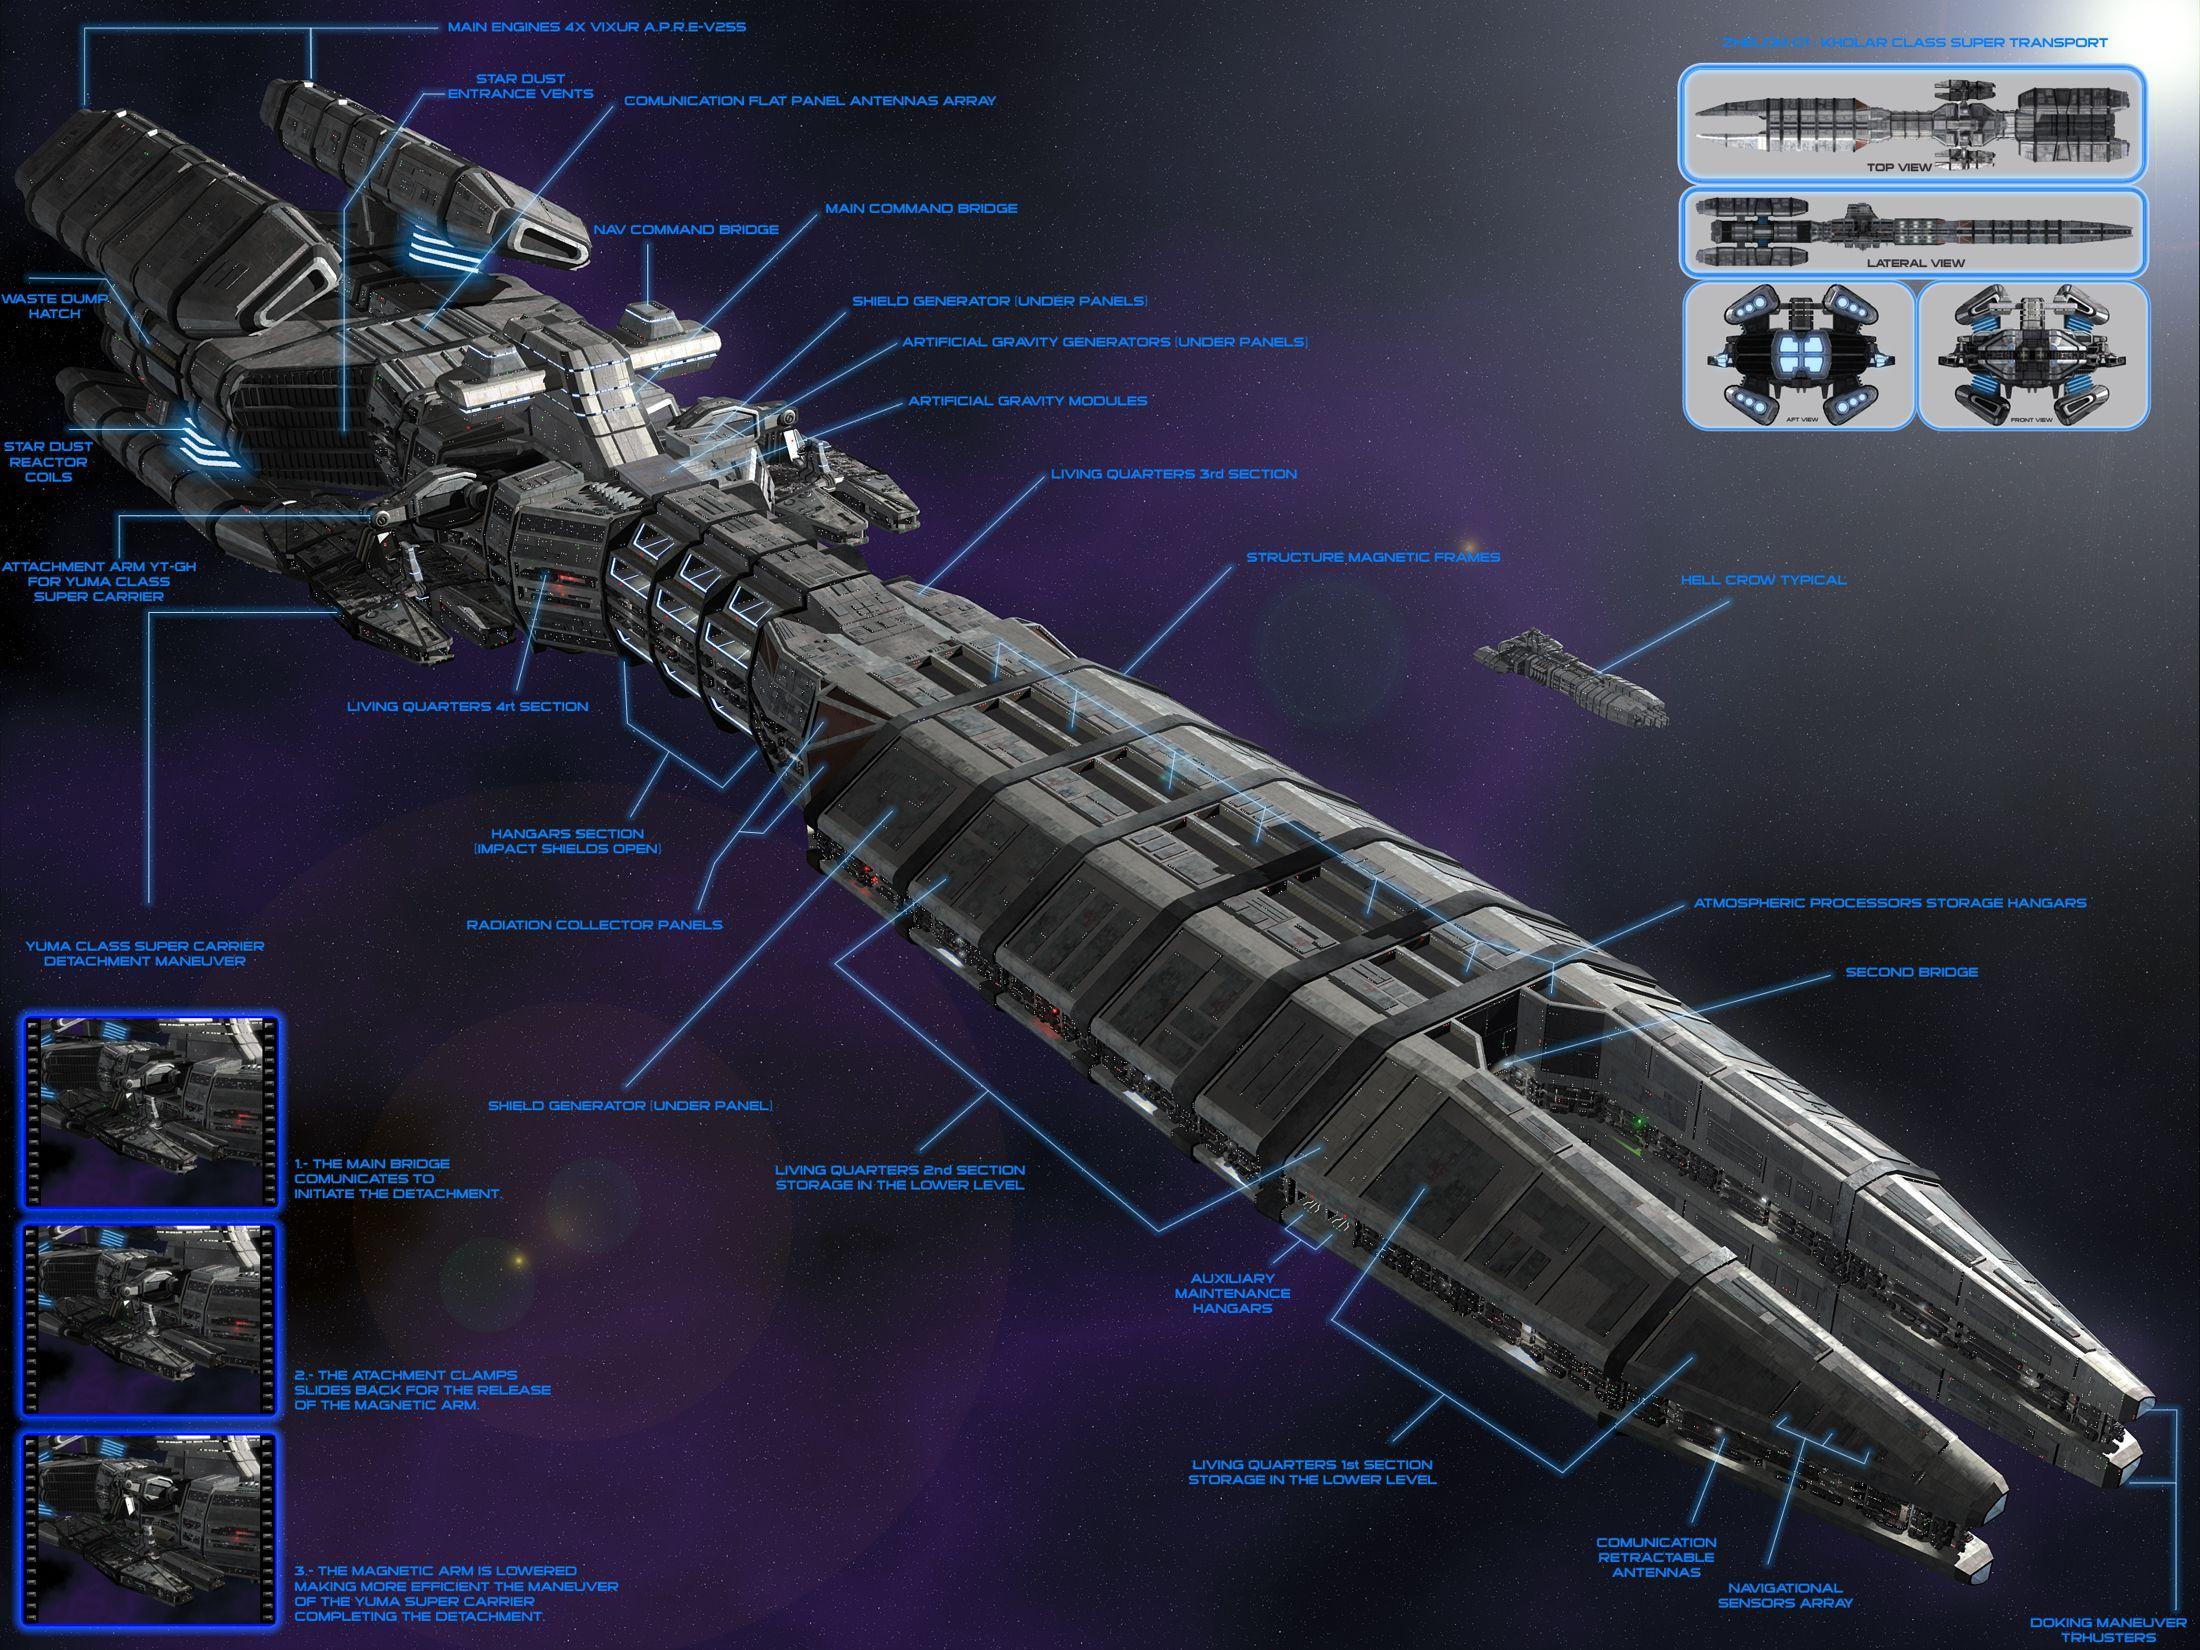 Zhelom Specs2 Jpg 2200 1650 Space Engineers Spaceship Starship Design